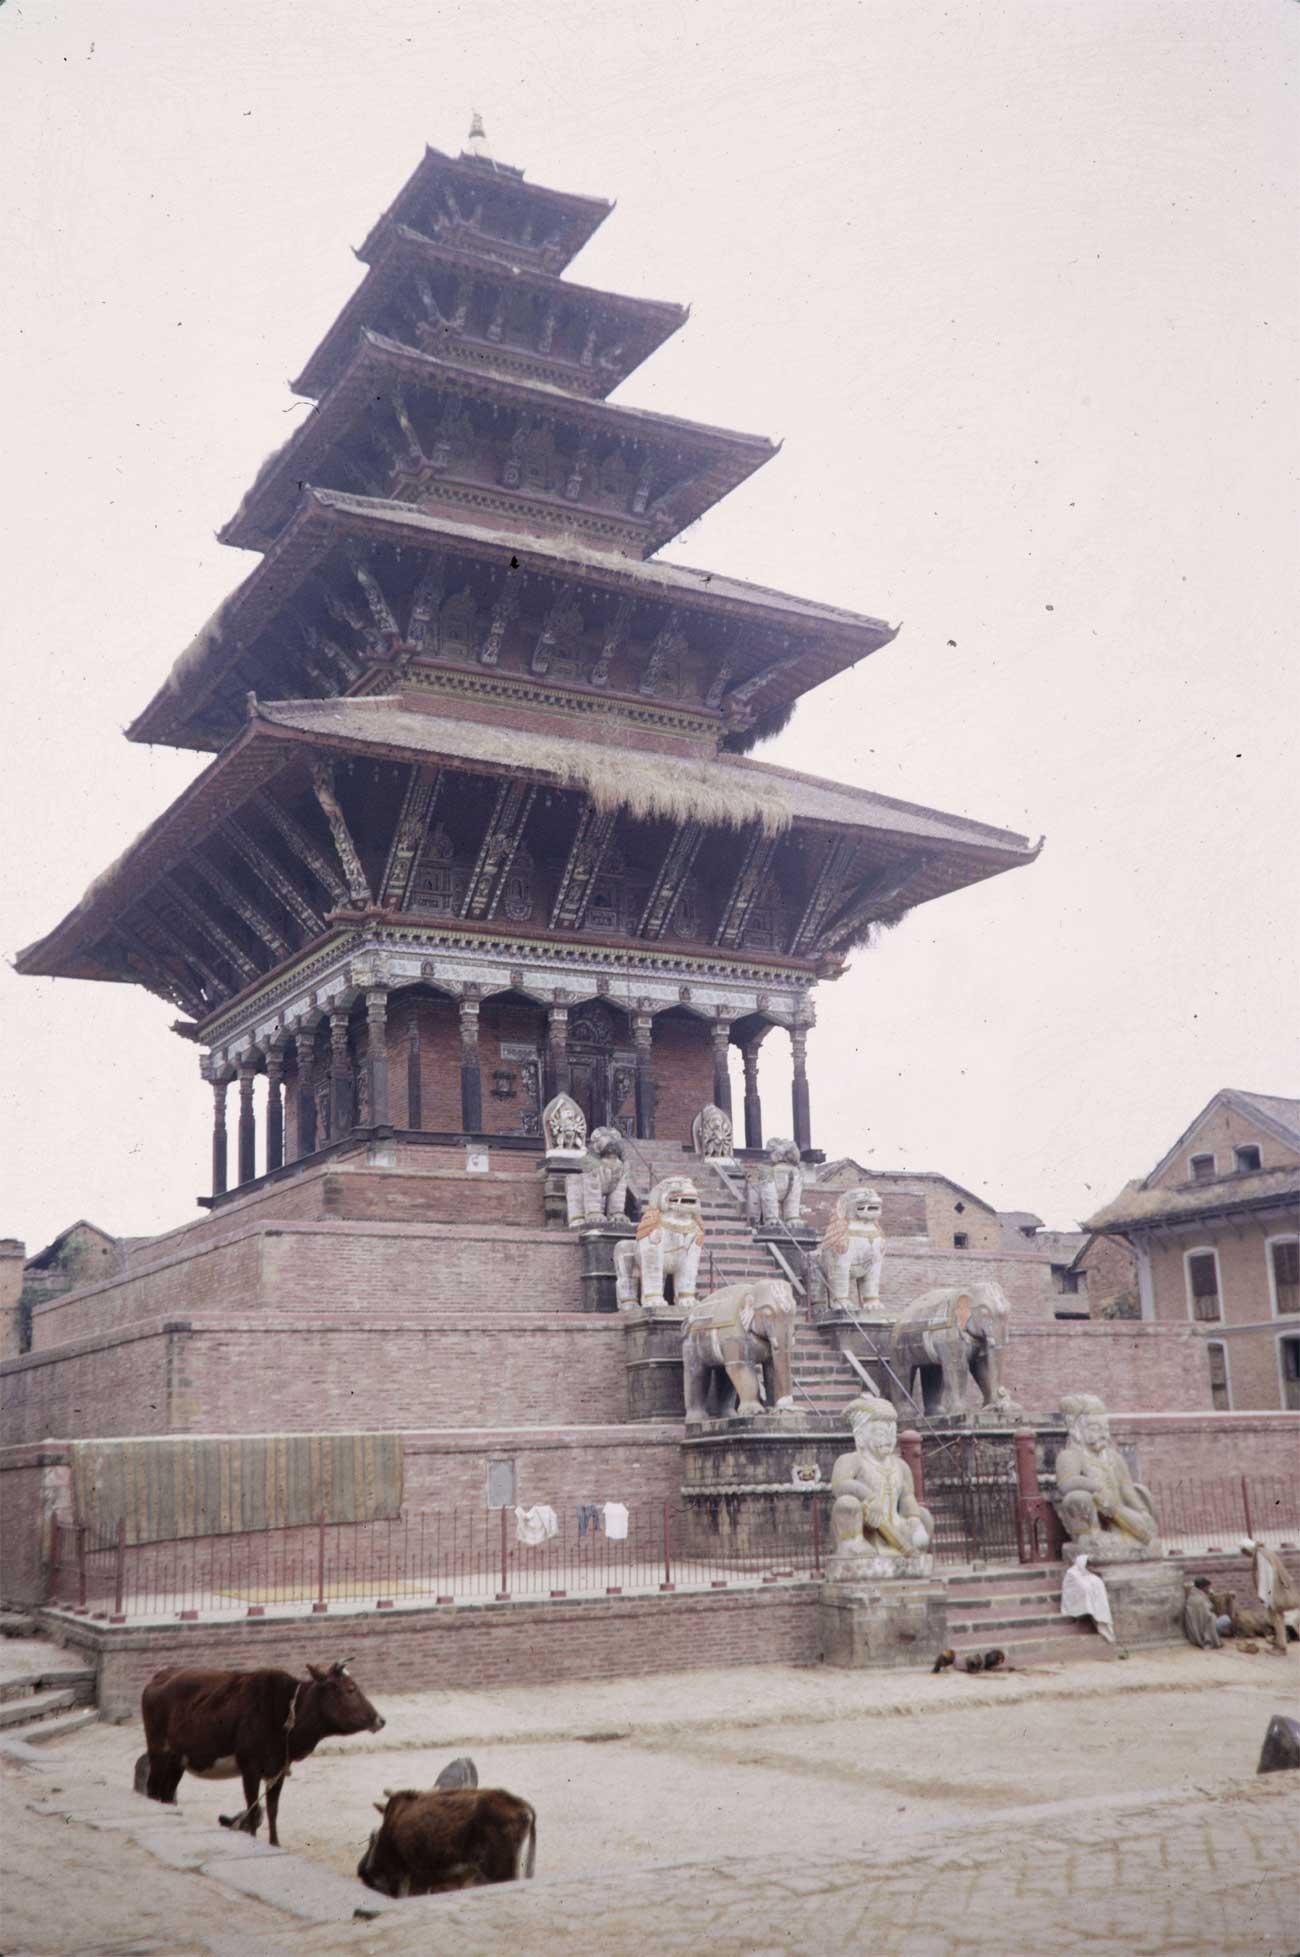 Nyatapola Temple in Bhaktapur Nepal (1960s) image